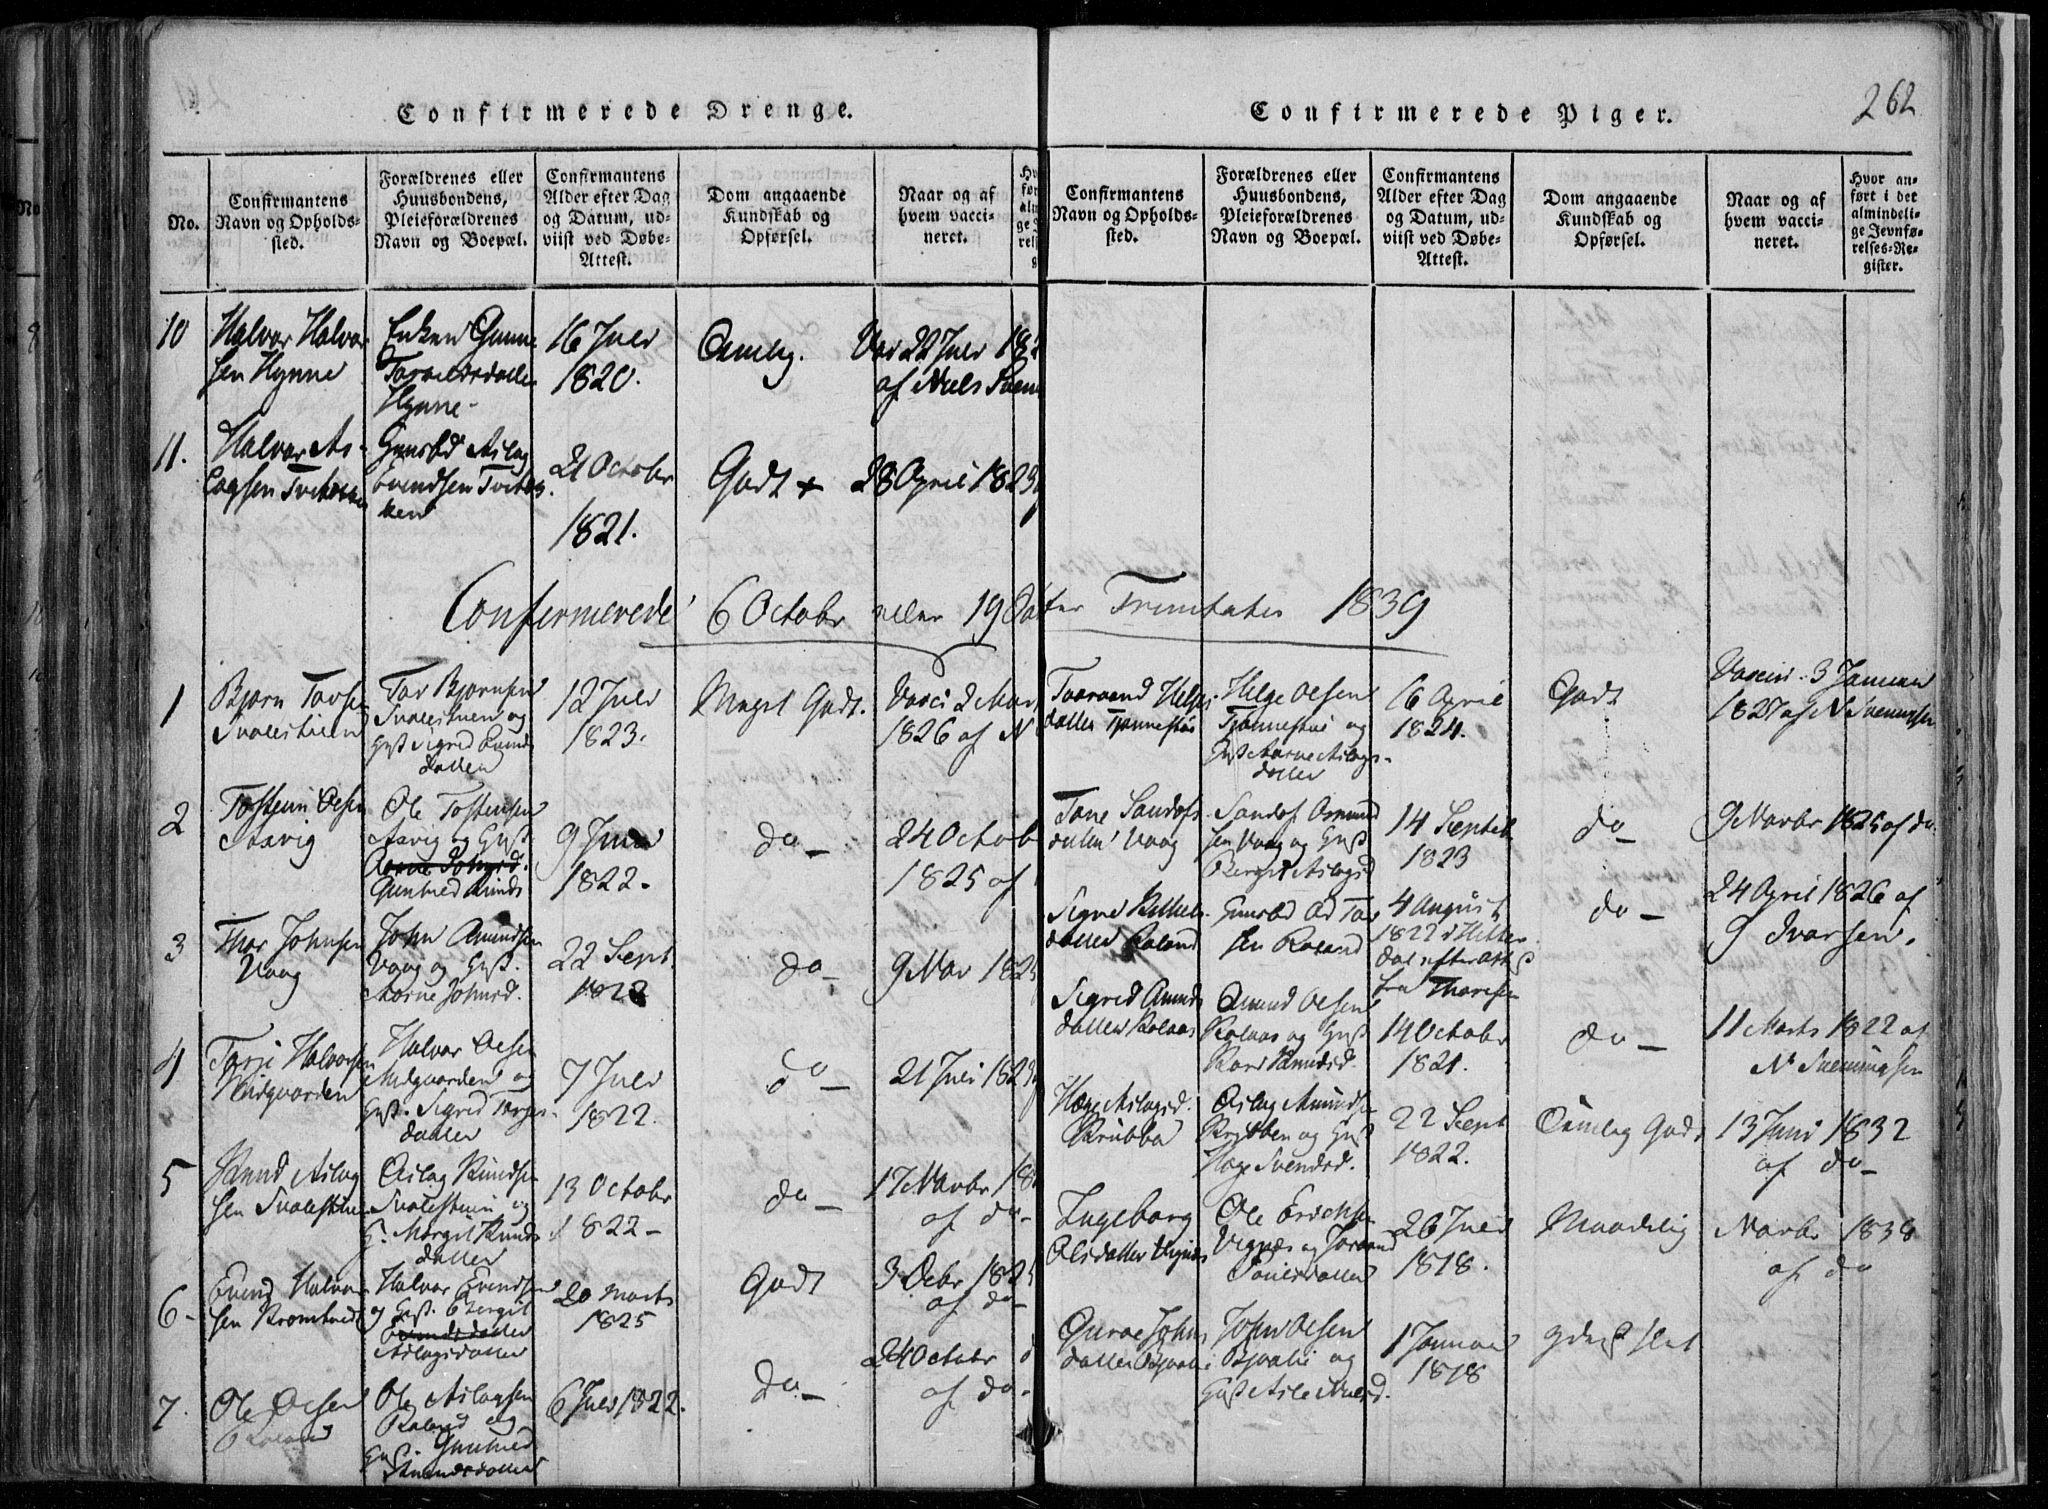 SAKO, Rauland kirkebøker, F/Fa/L0001: Ministerialbok nr. 1, 1814-1859, s. 262